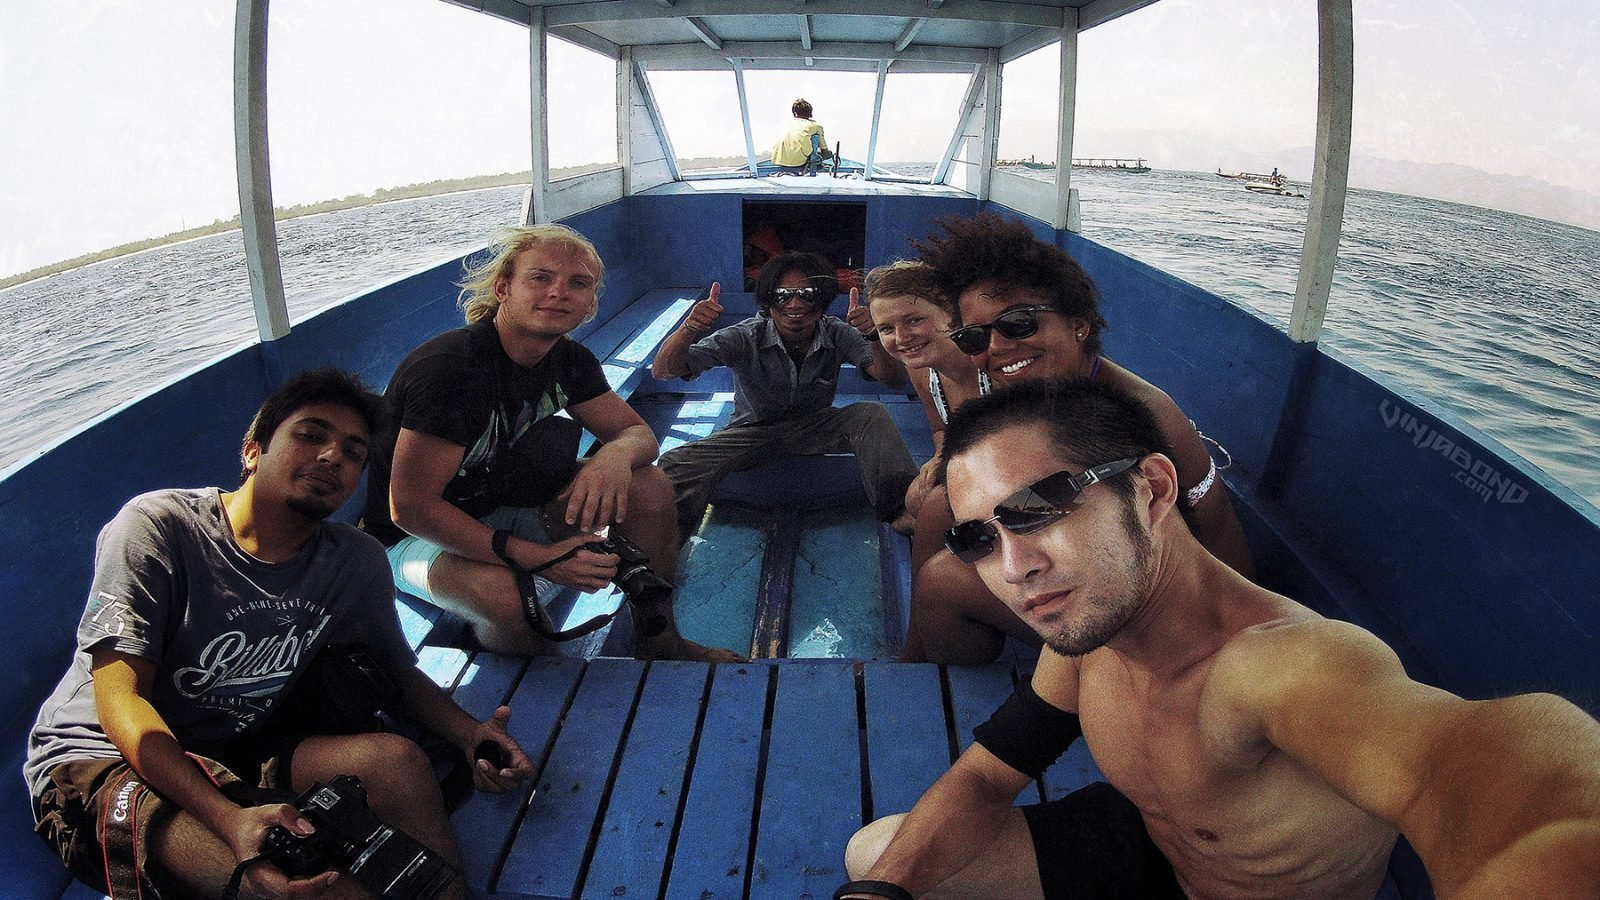 Island Hopping The Gili Islands in Indonesia // VAGABONDING